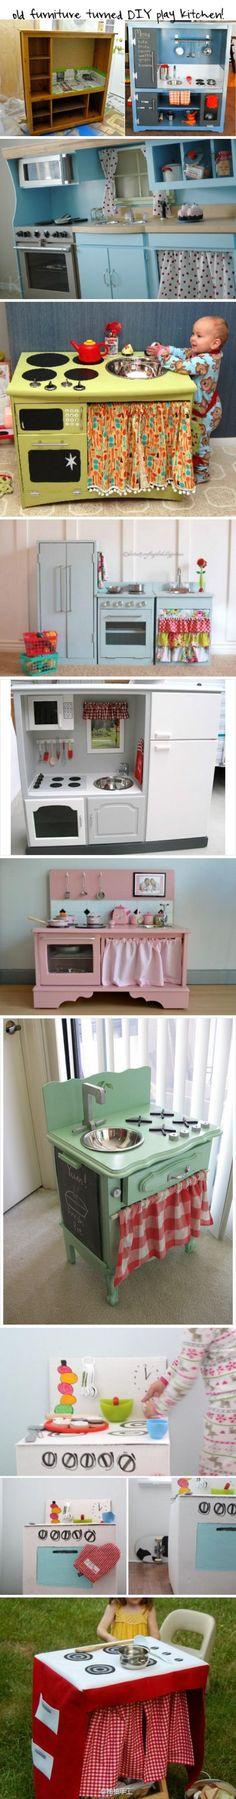 Little kitchens! - Here's the Deal! @Keli Jones